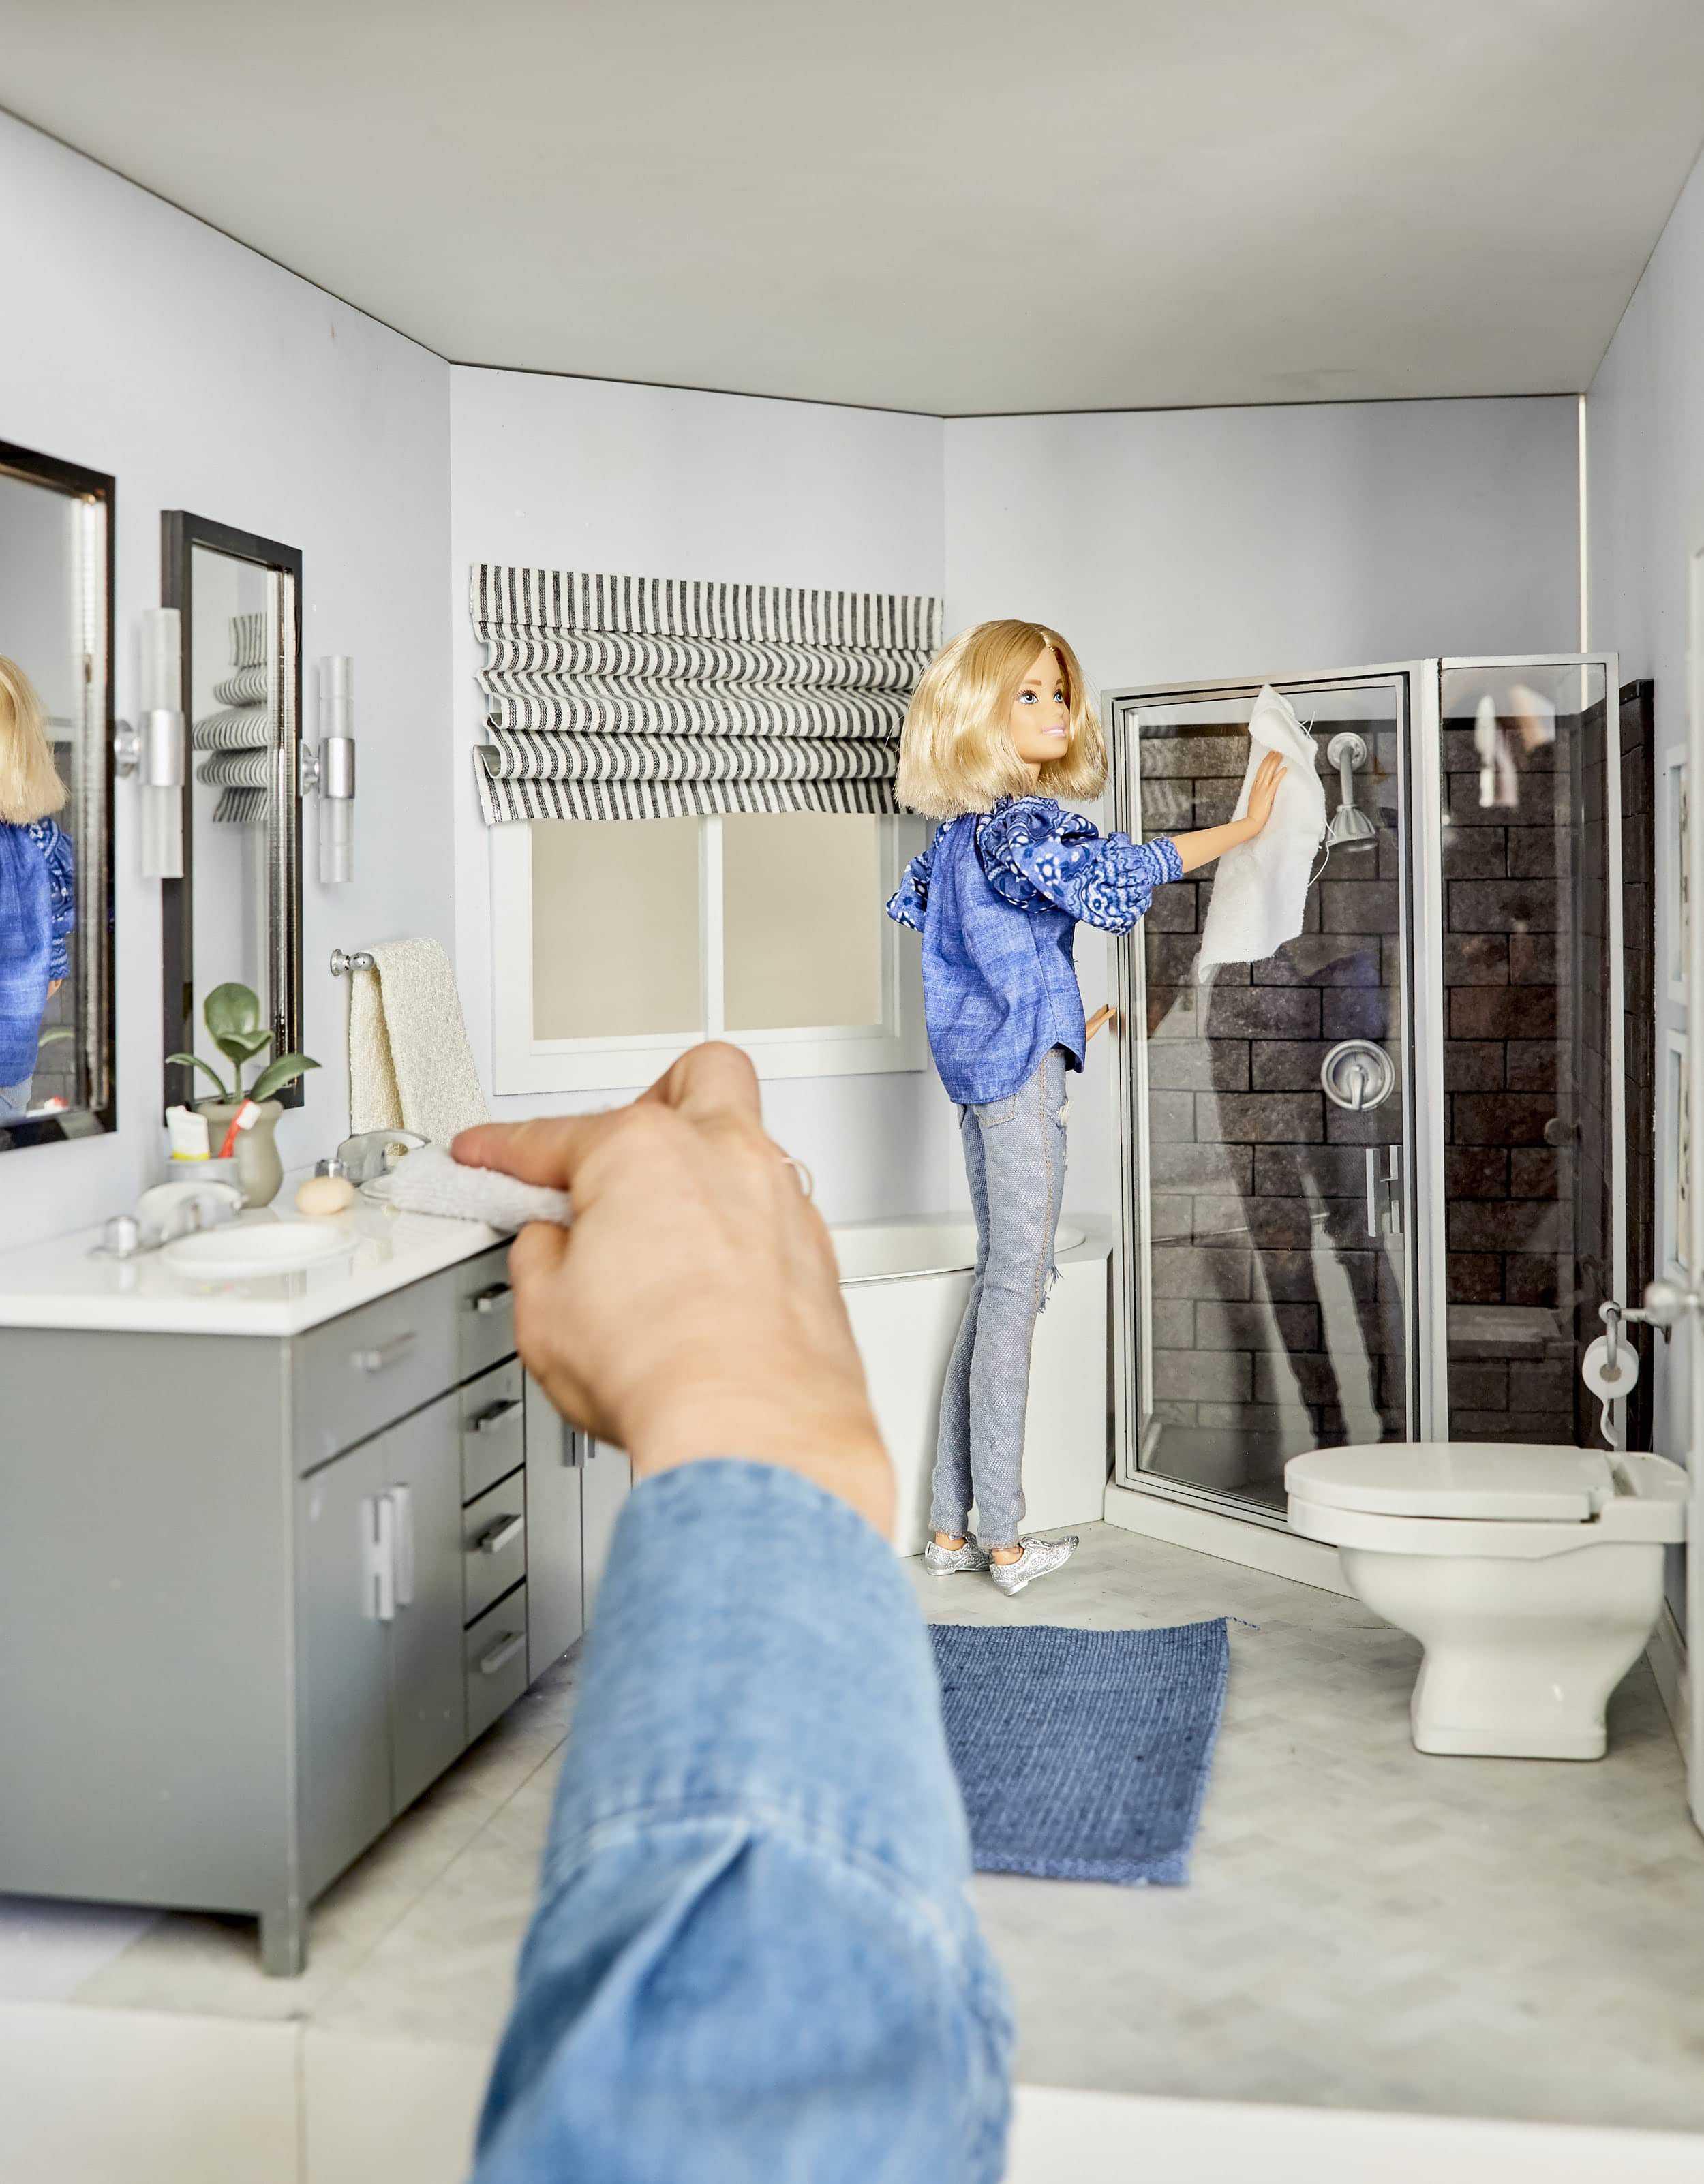 Emily Henderson Culligan Water Softener